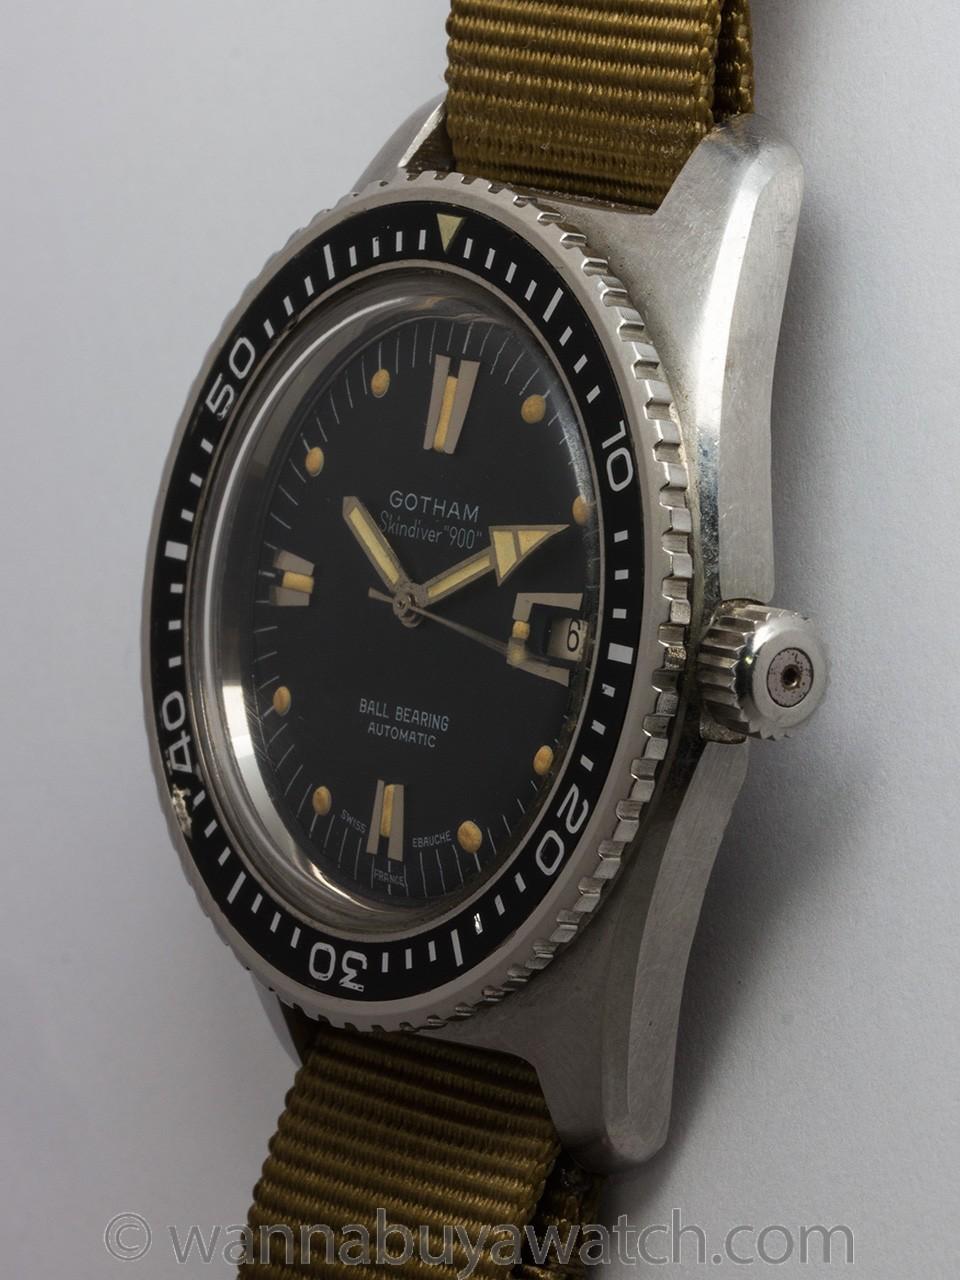 Gotham SS Swiss Skin Diver 900 circa 1960's